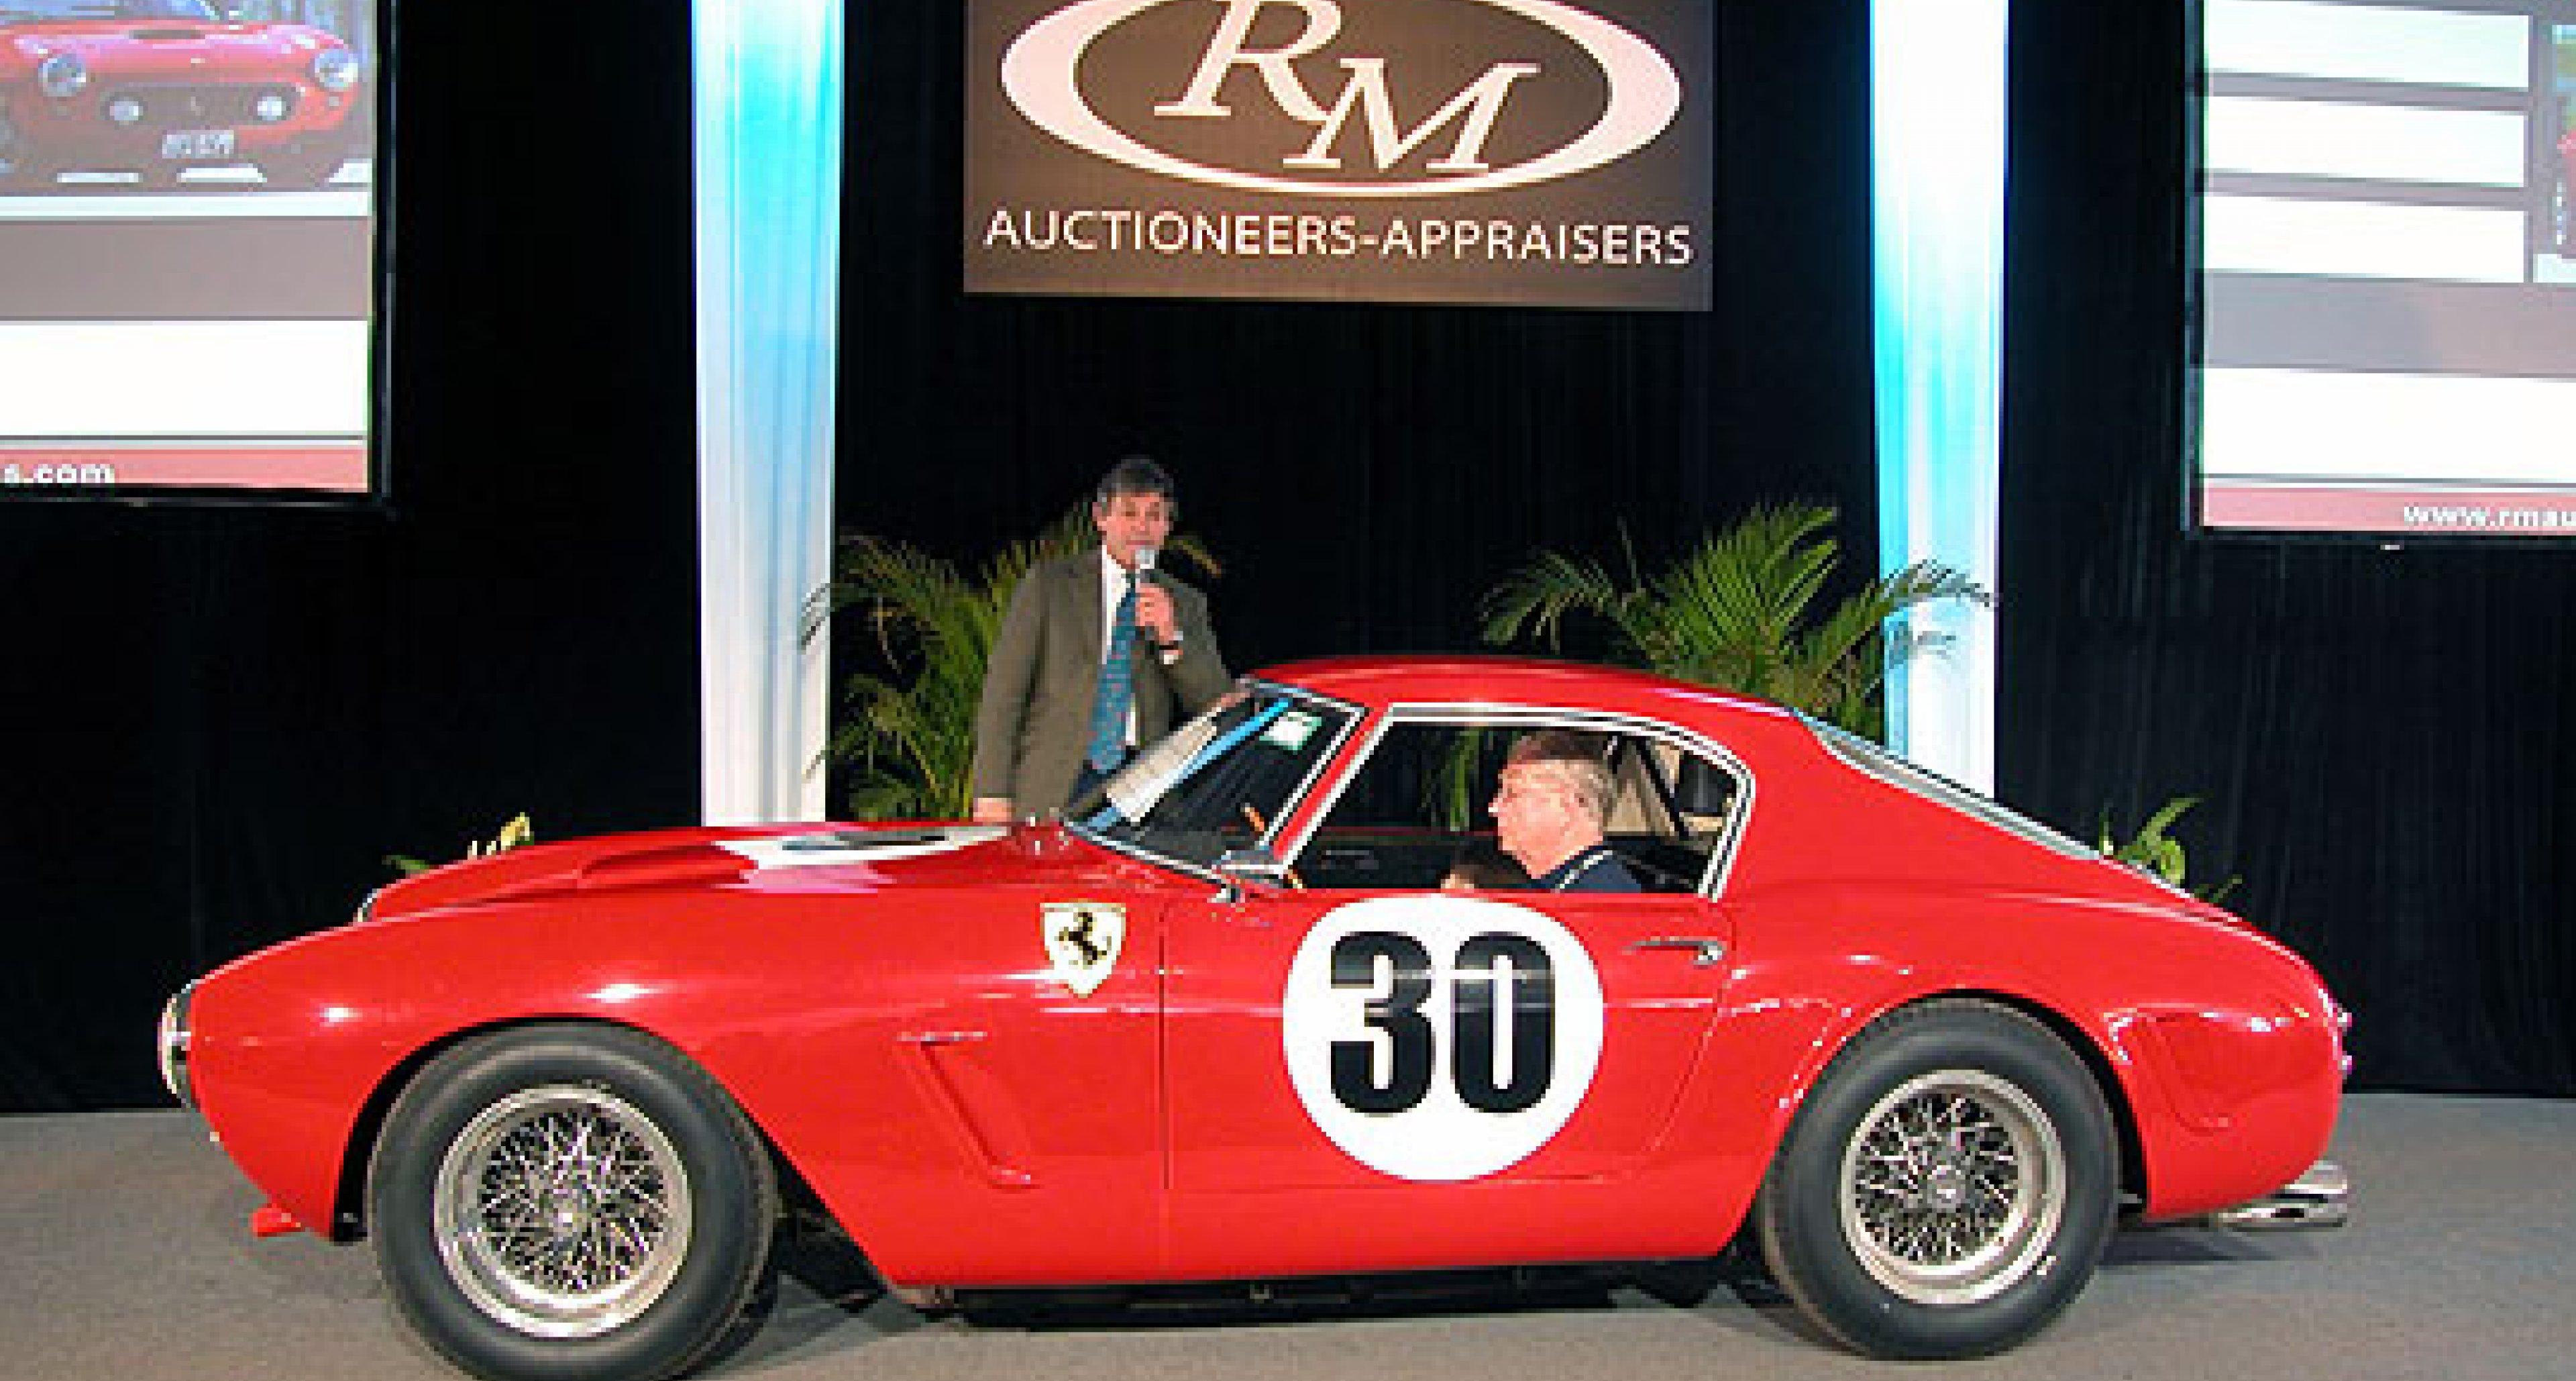 RM Amelia Island Auktion 2006 - Rückblick